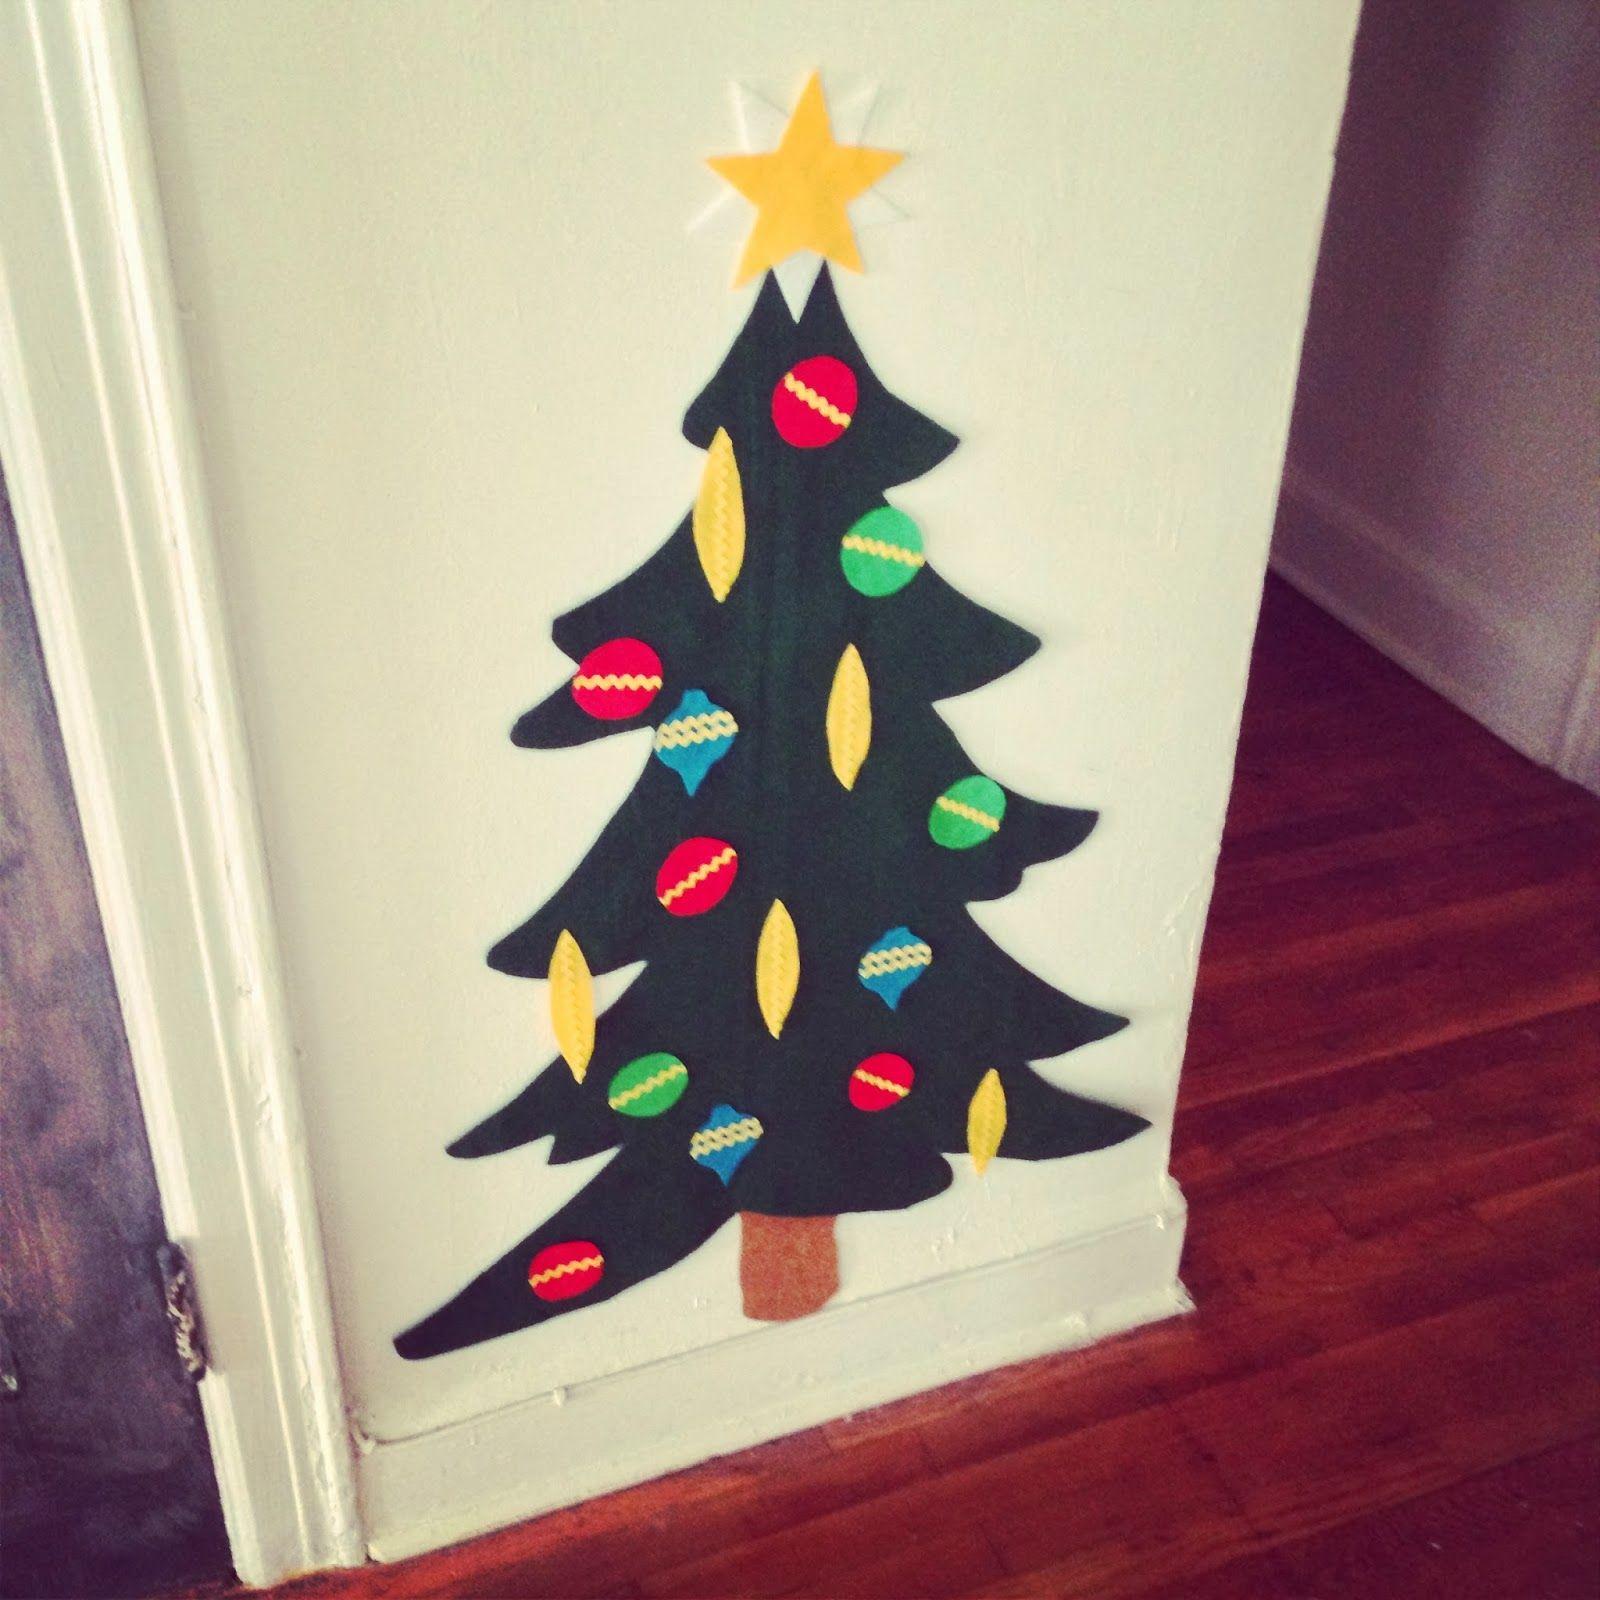 Ideas En Fieltro Para Estas Navidades Rbol De Navidad En Fieltro  ~ Crismas De Navidad Hechos Por  Ninos